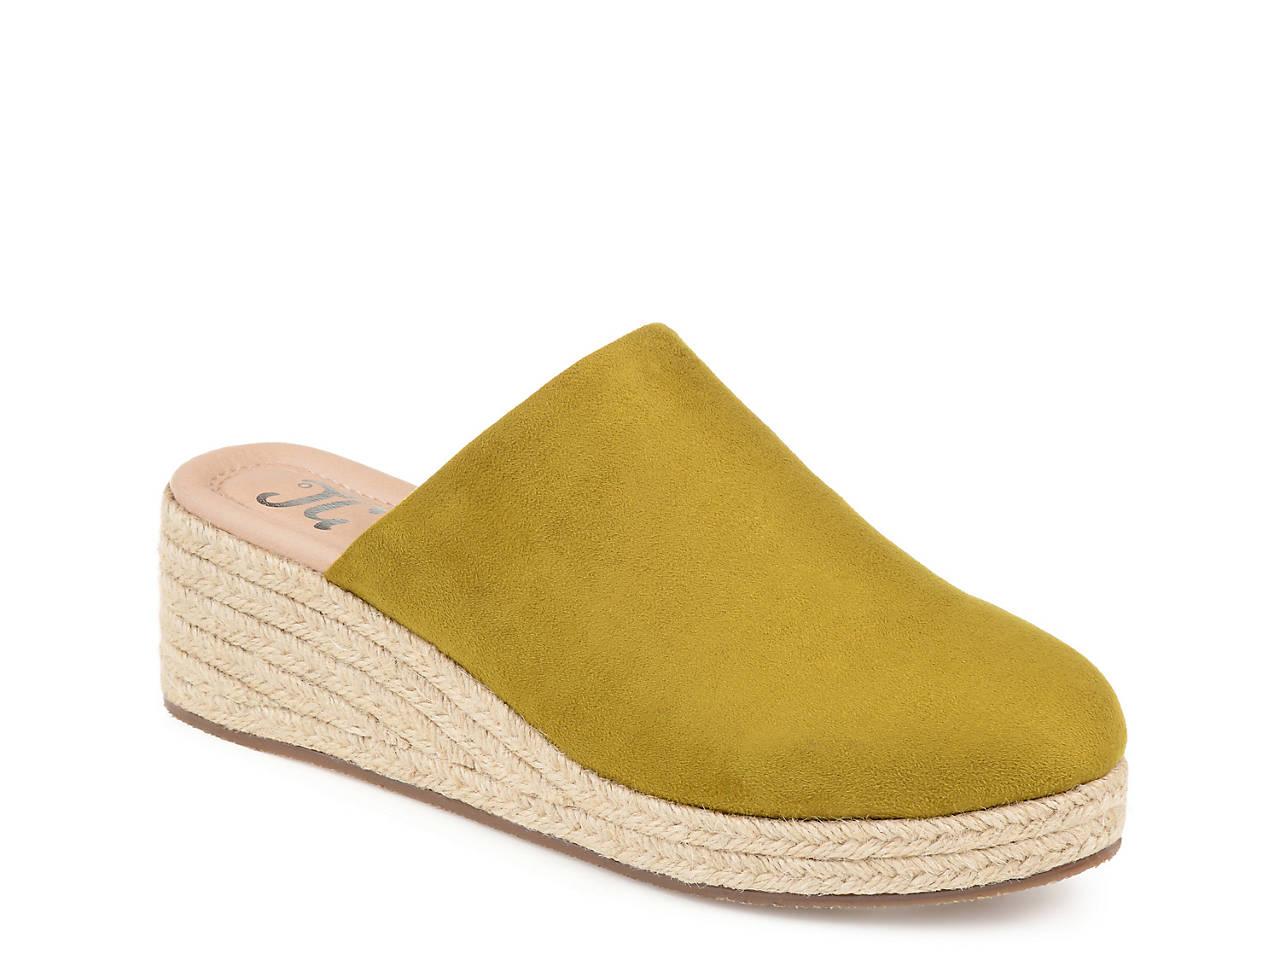 a0f5ec62ac22 Journee Collection Lolita Espadrille Wedge Mule Women s Shoes